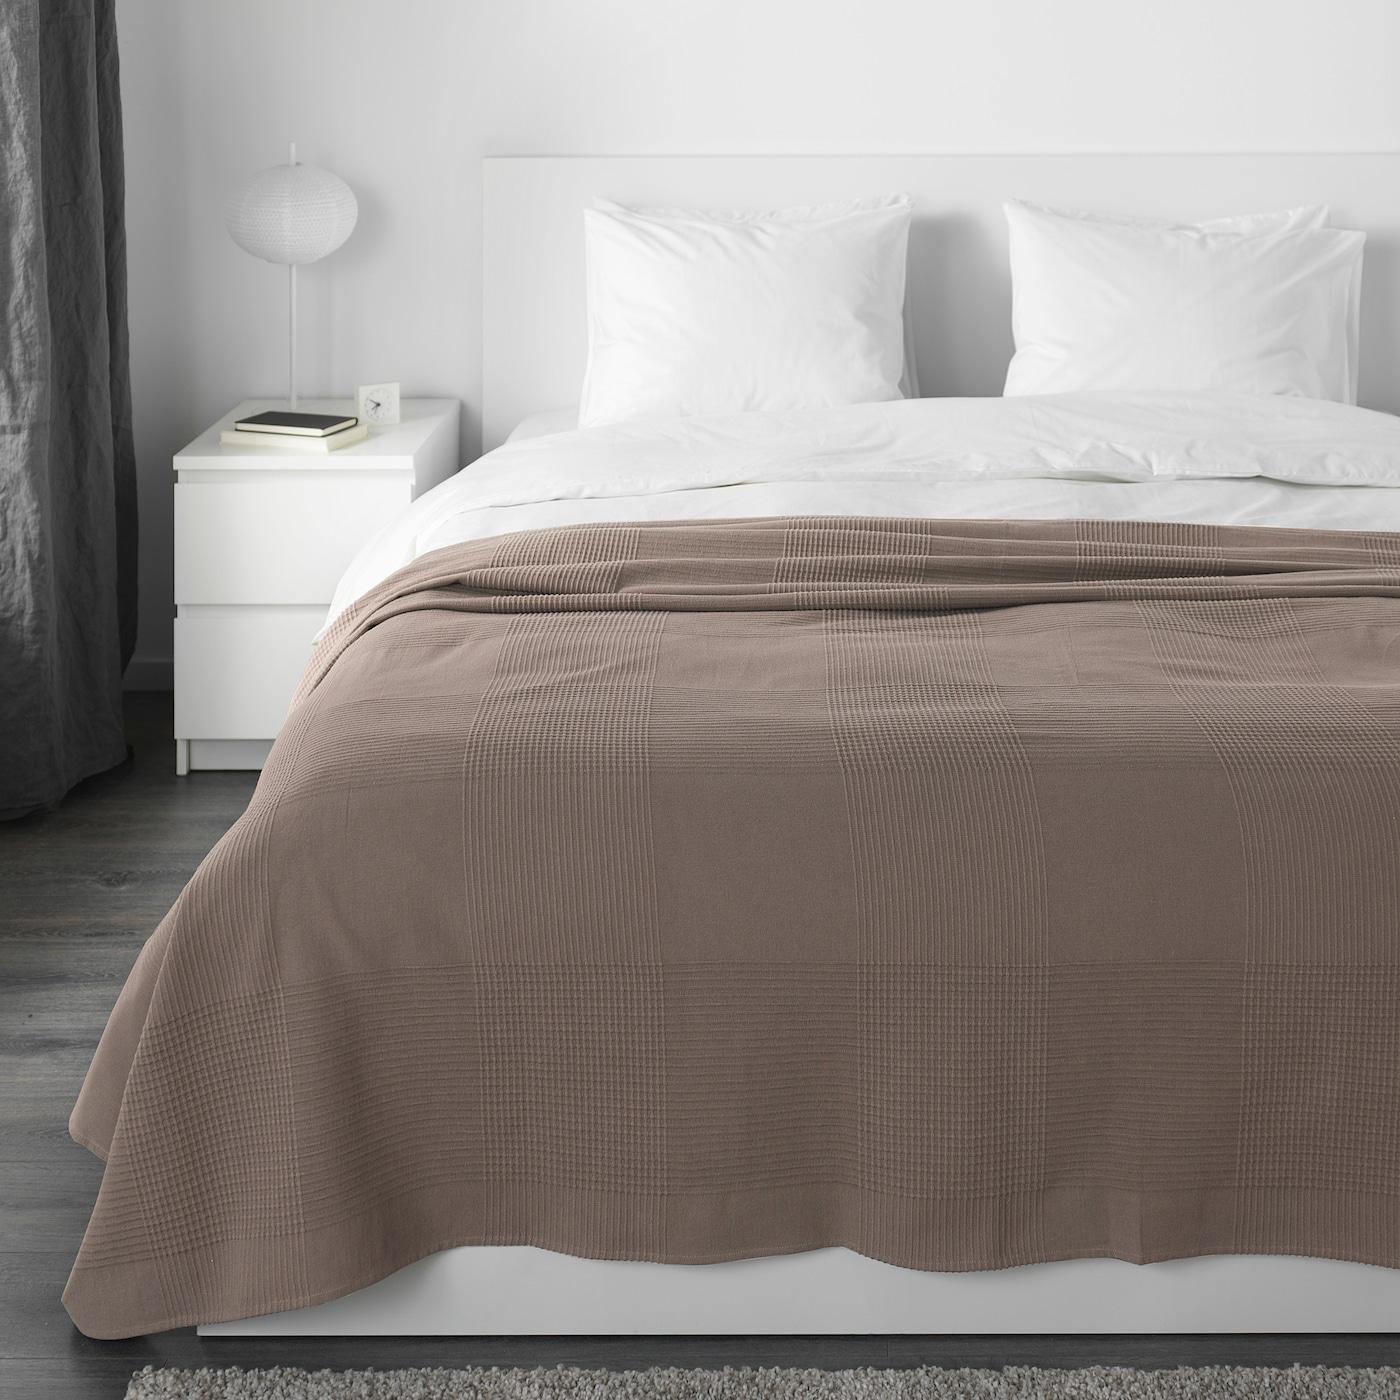 INDIRA Couvre-lit - brun clair - IKEA